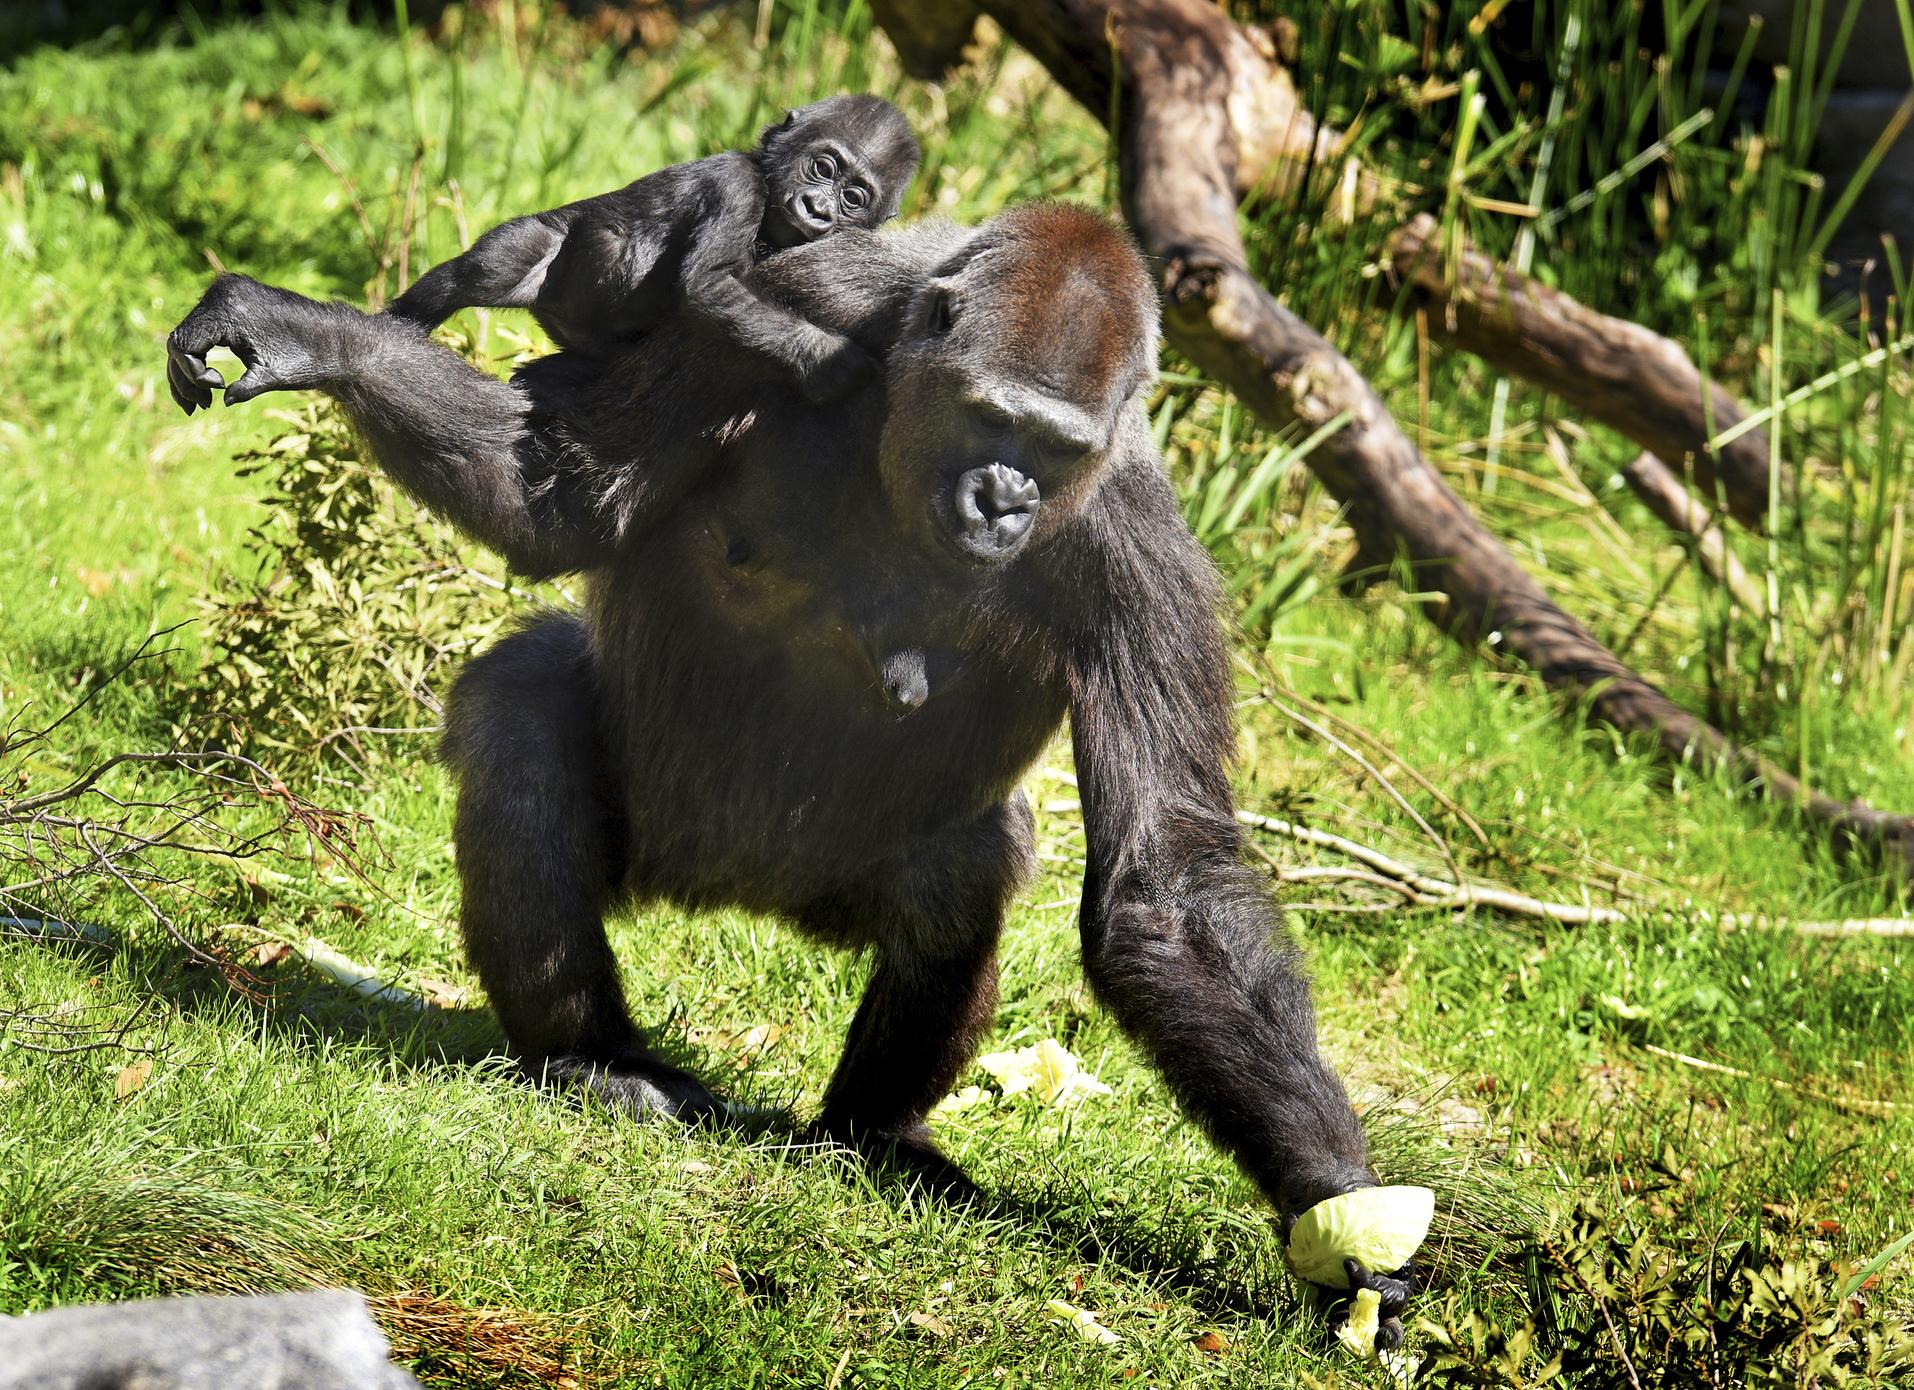 Zoo_Gorilla_Surrogate_47006-159532.jpg02959774